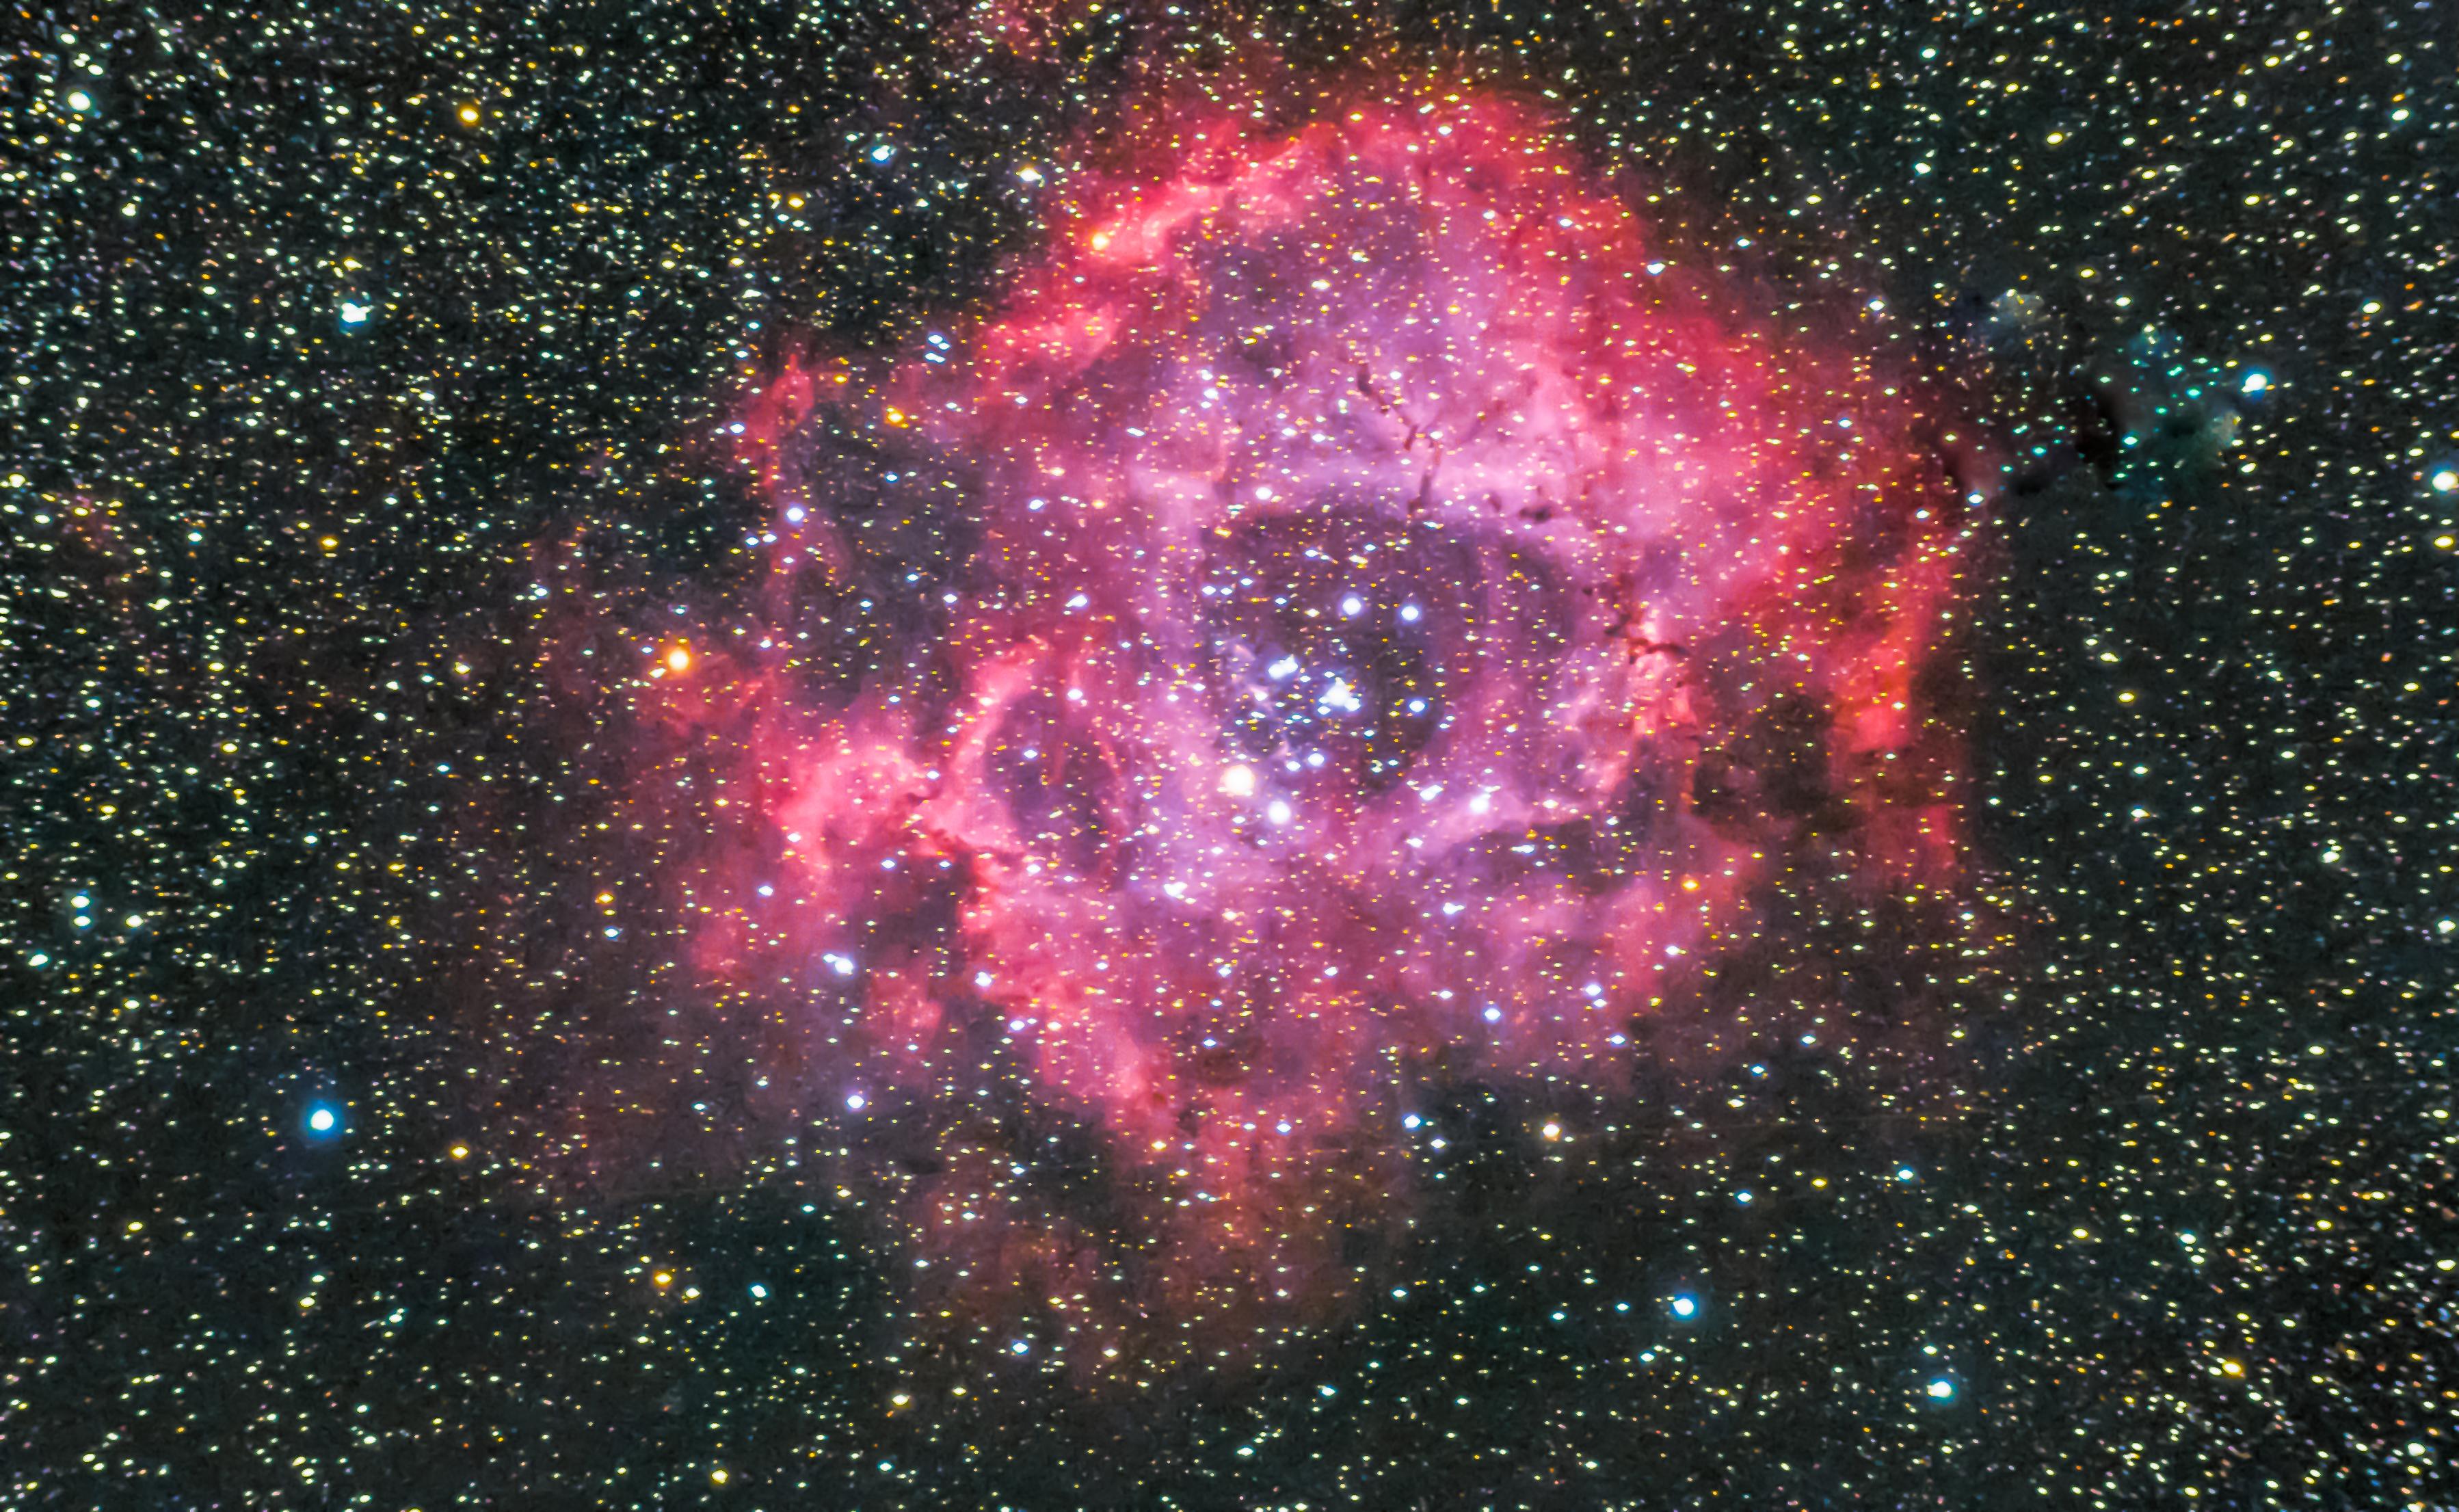 rosette nebula, caldwell 49